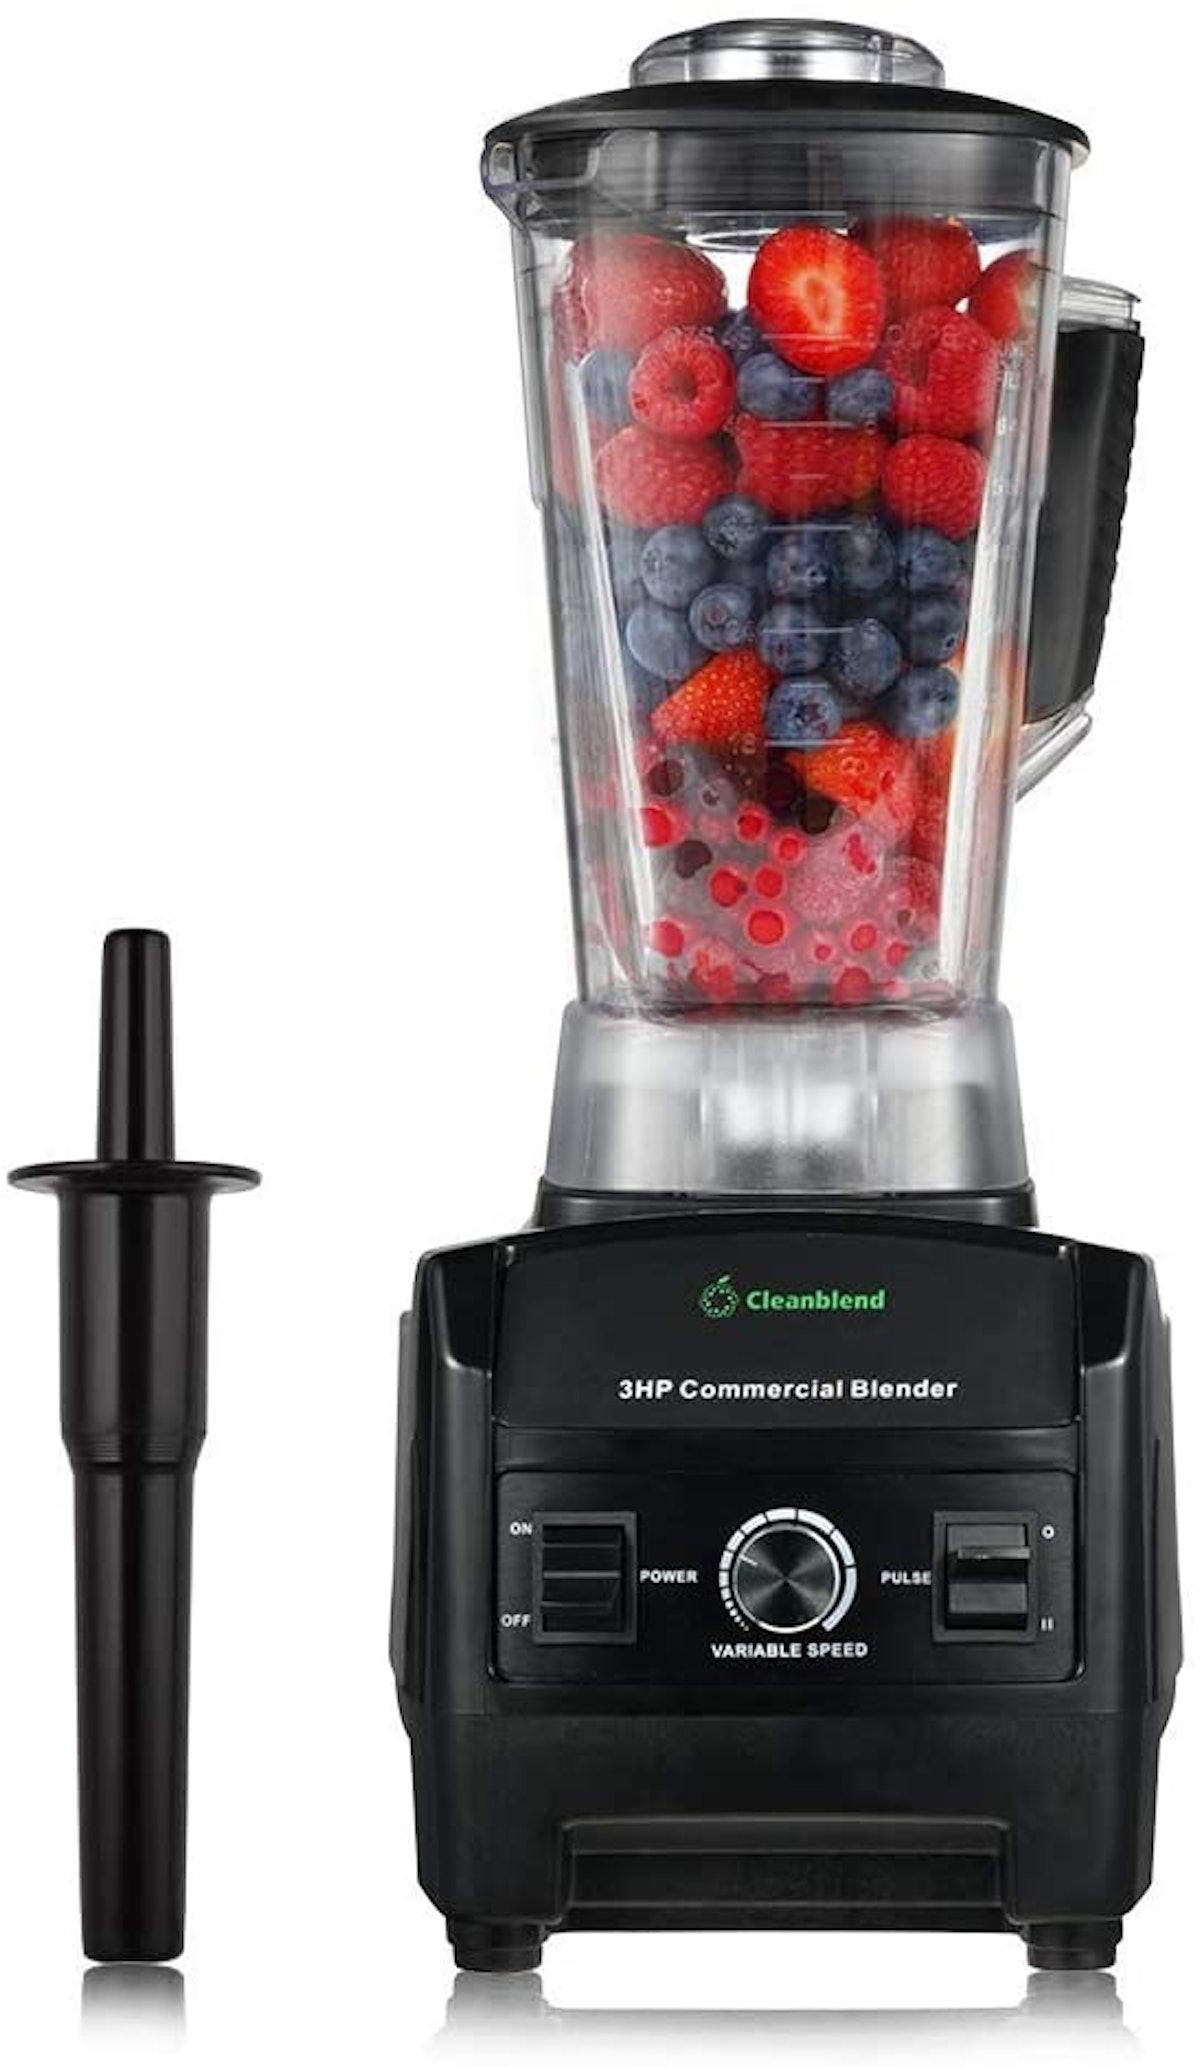 Cleanblend 64 oz. Commercial Blender